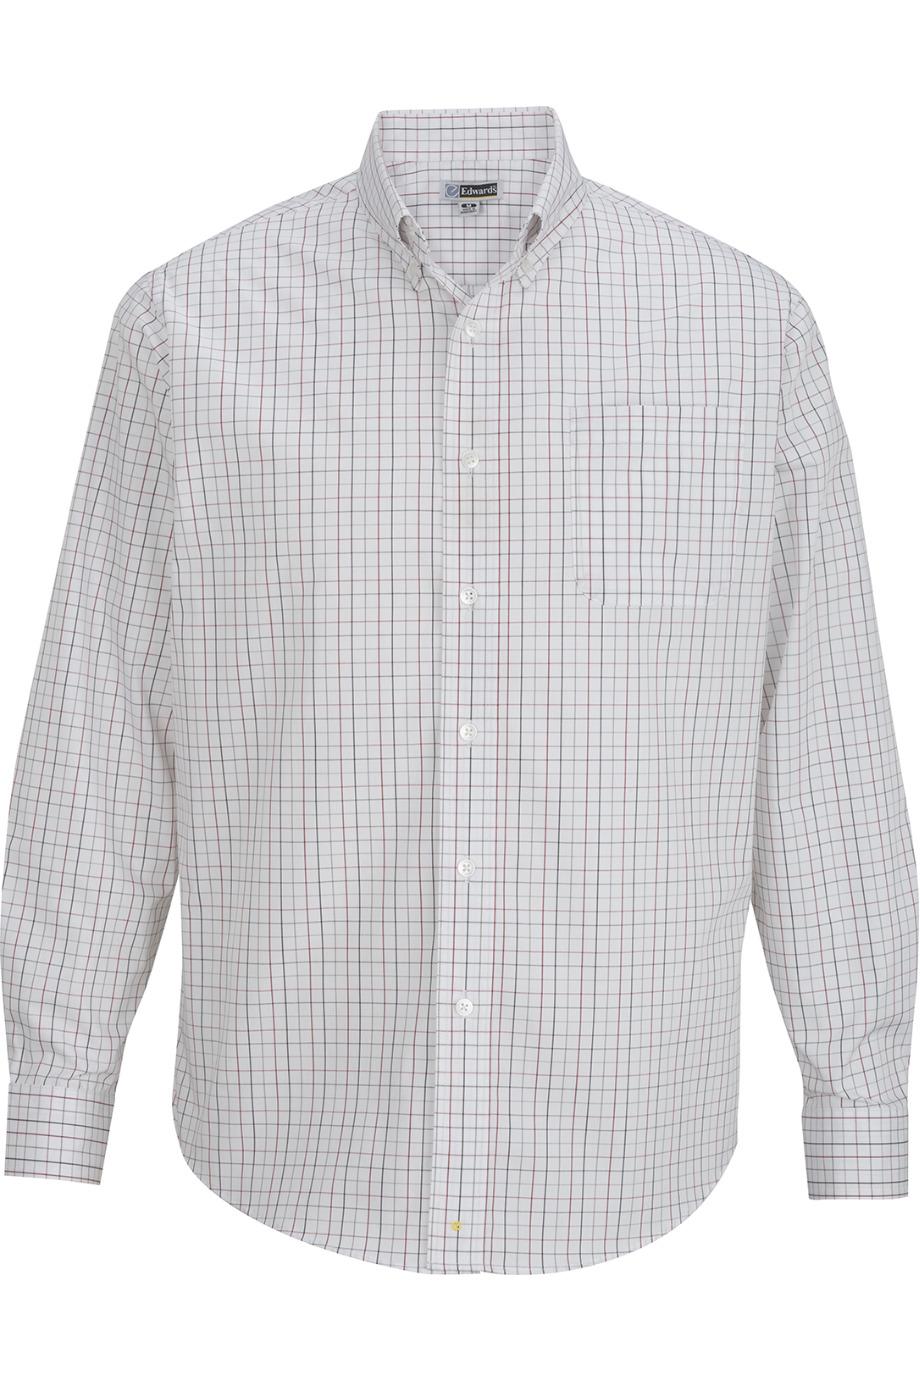 Edwards Garment 1973 - Men's Tattersall Poplin Shirt